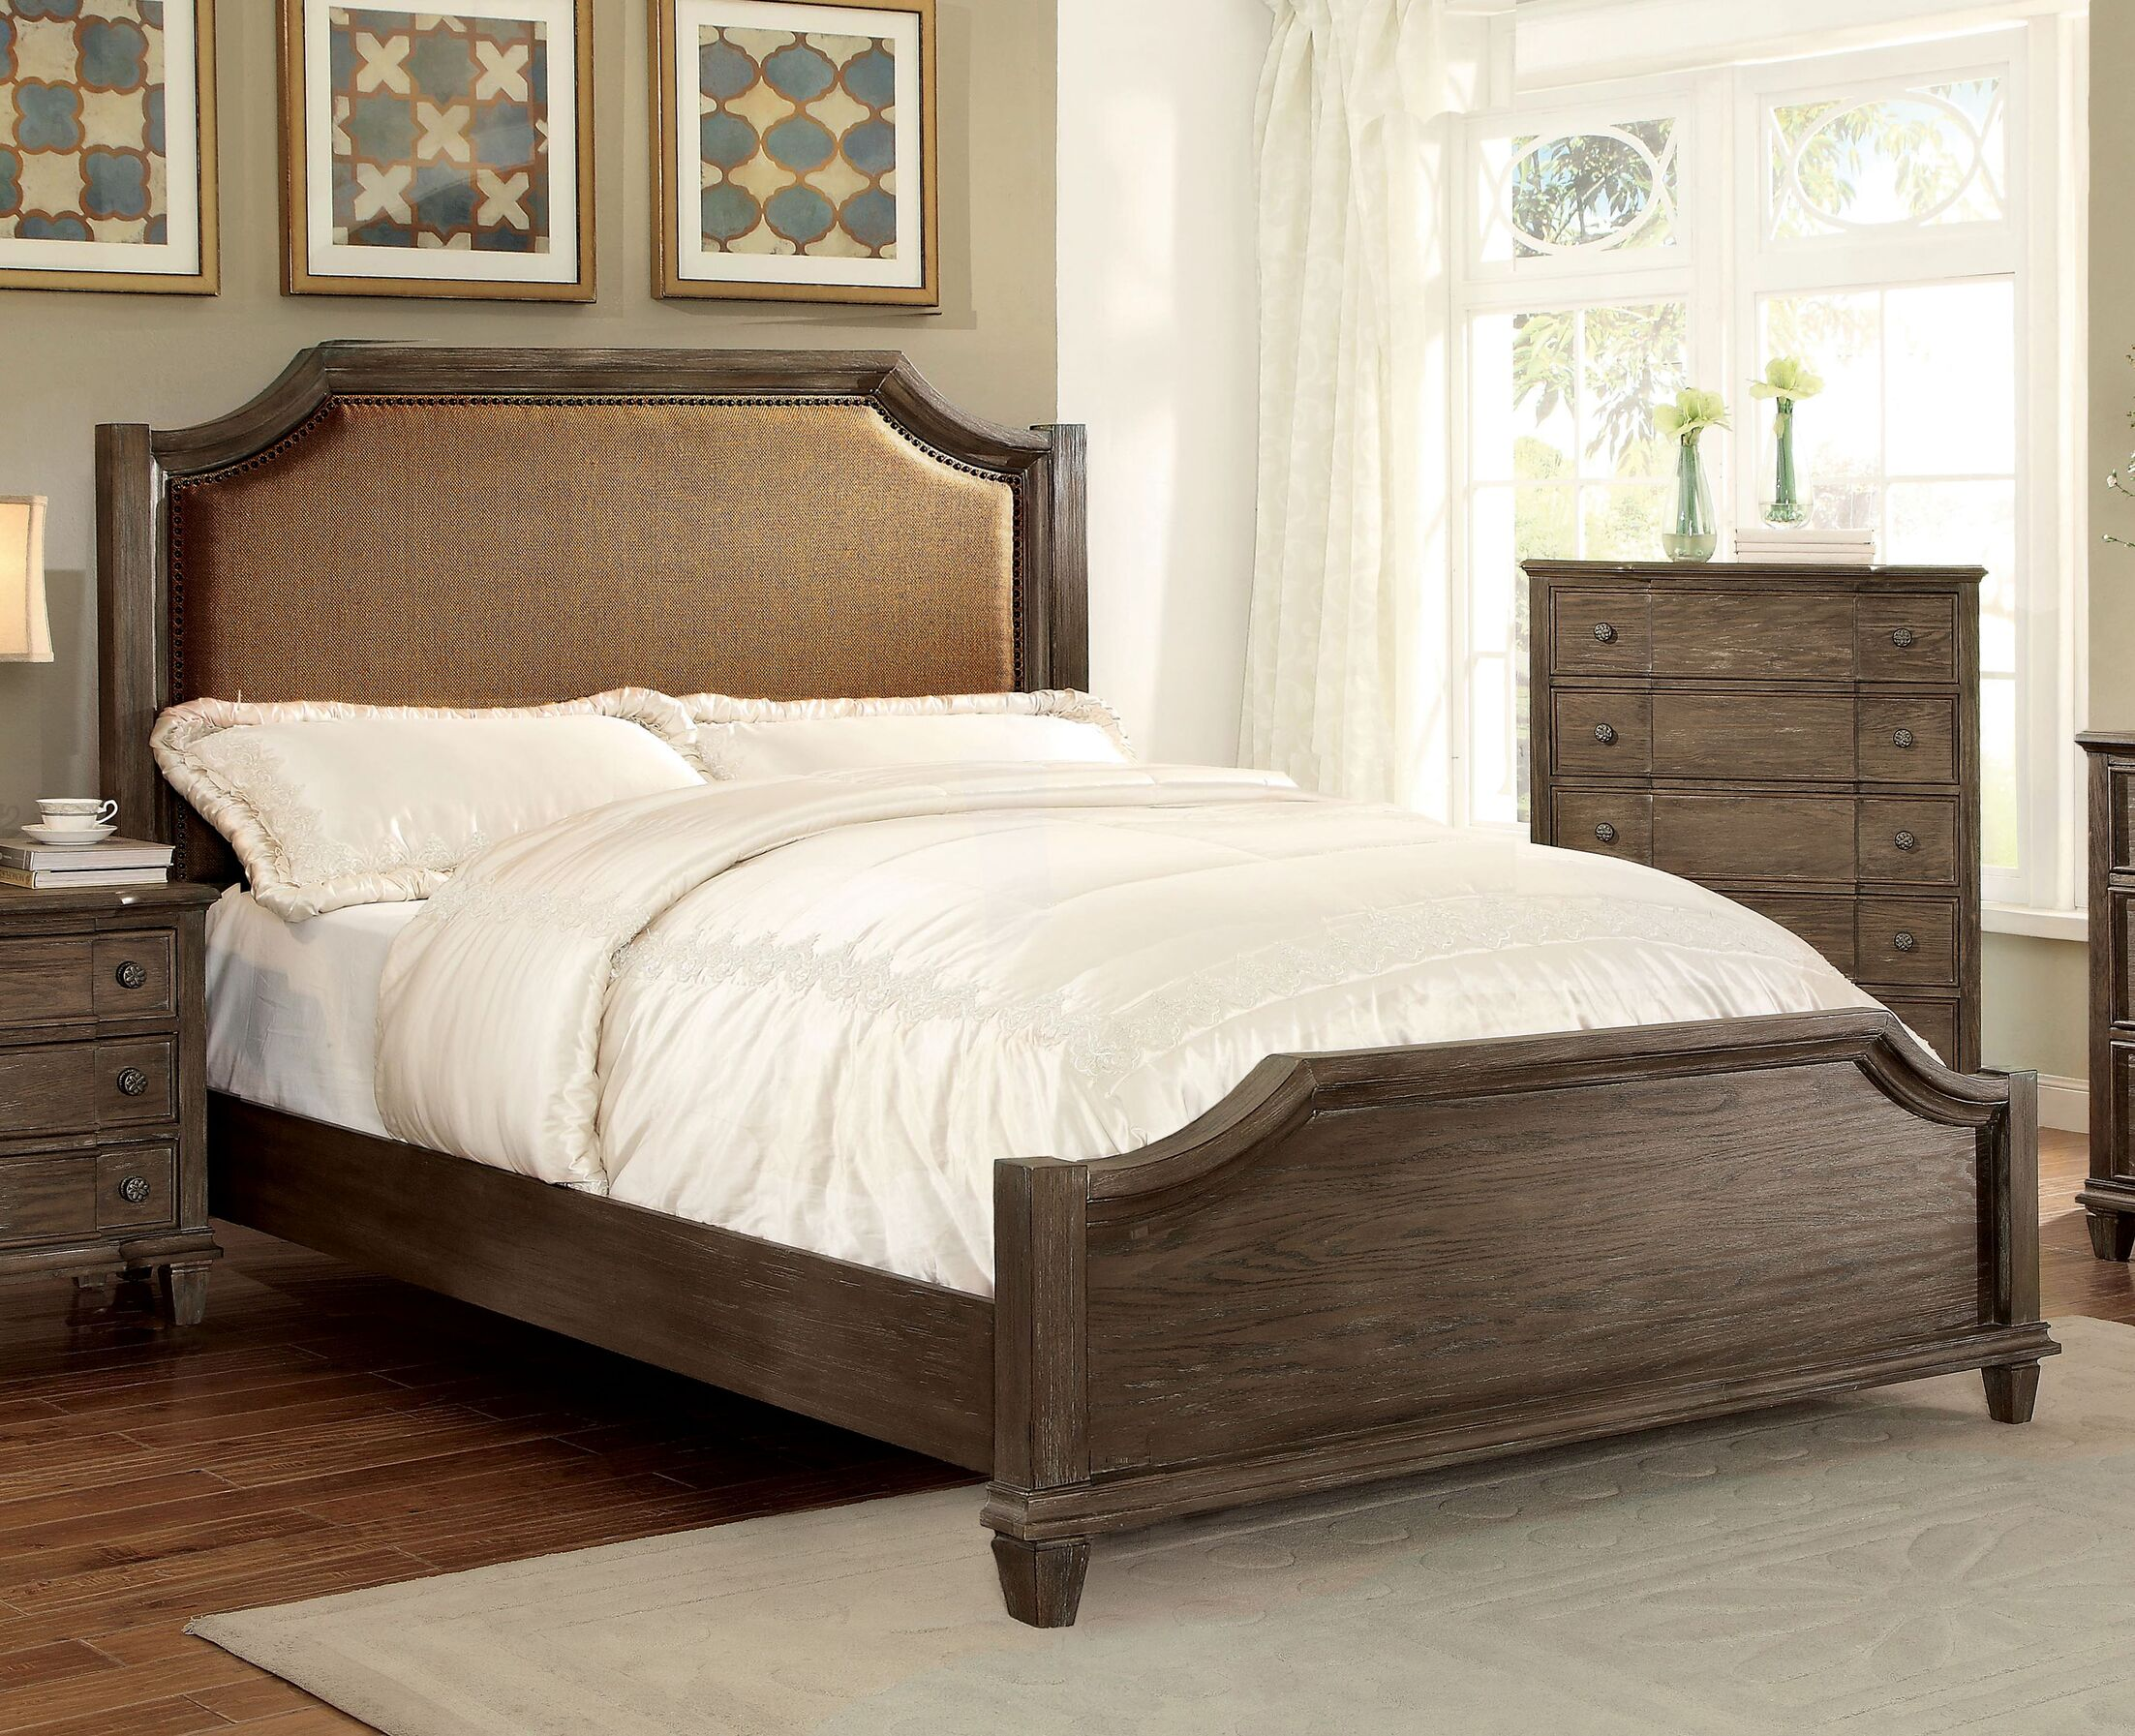 Arlington Upholstered Panel Bed